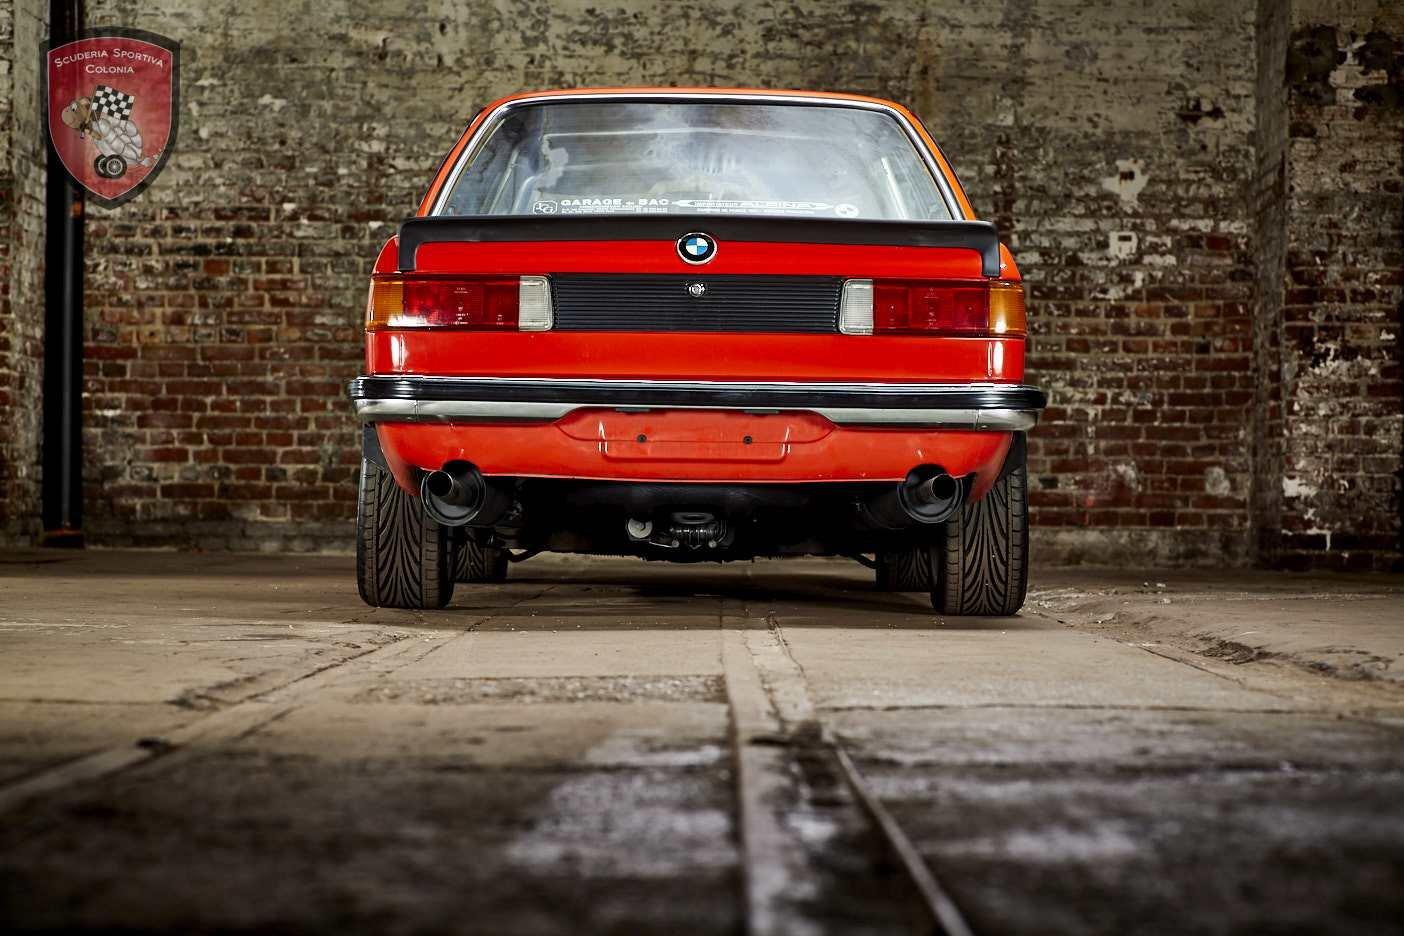 1982 BMW 323 Alpina C1 (E21) For Sale (picture 3 of 6)